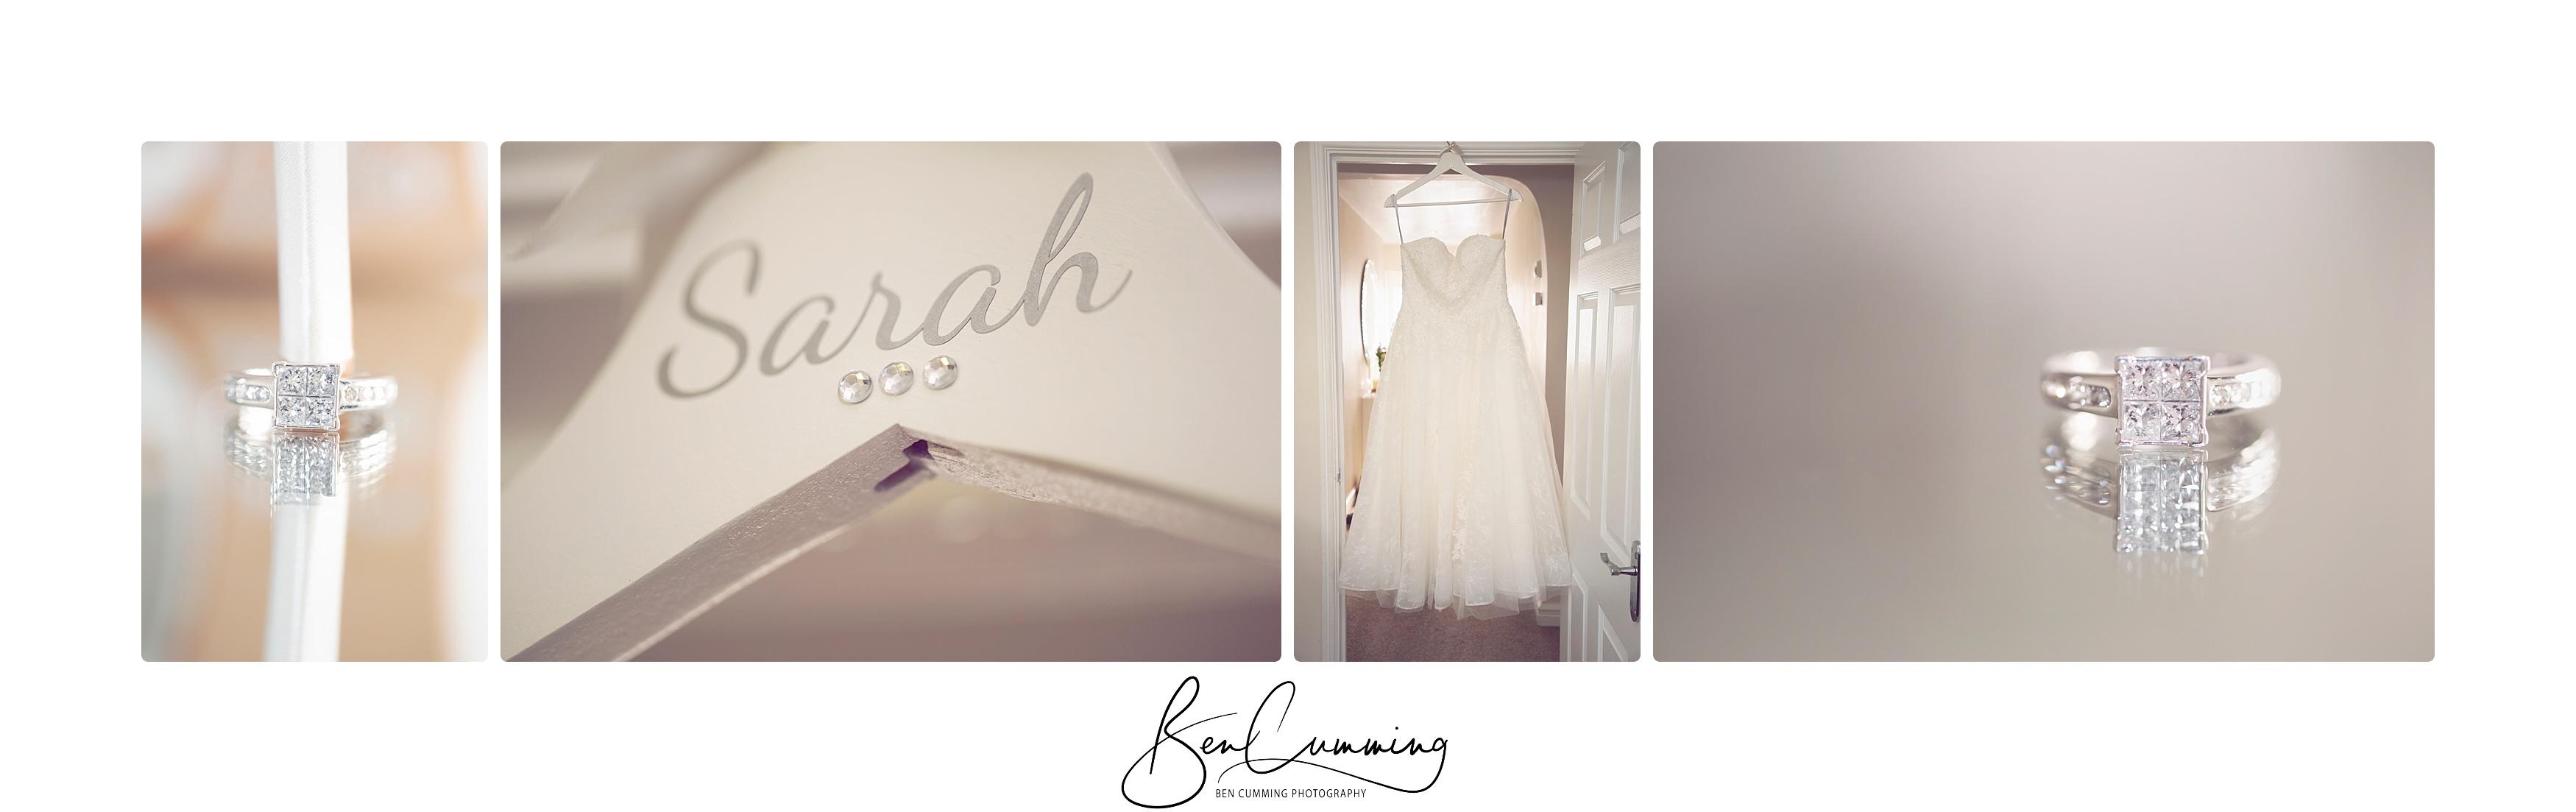 Leeds Wedding Photographer Ben Cumming Bridal Preparations